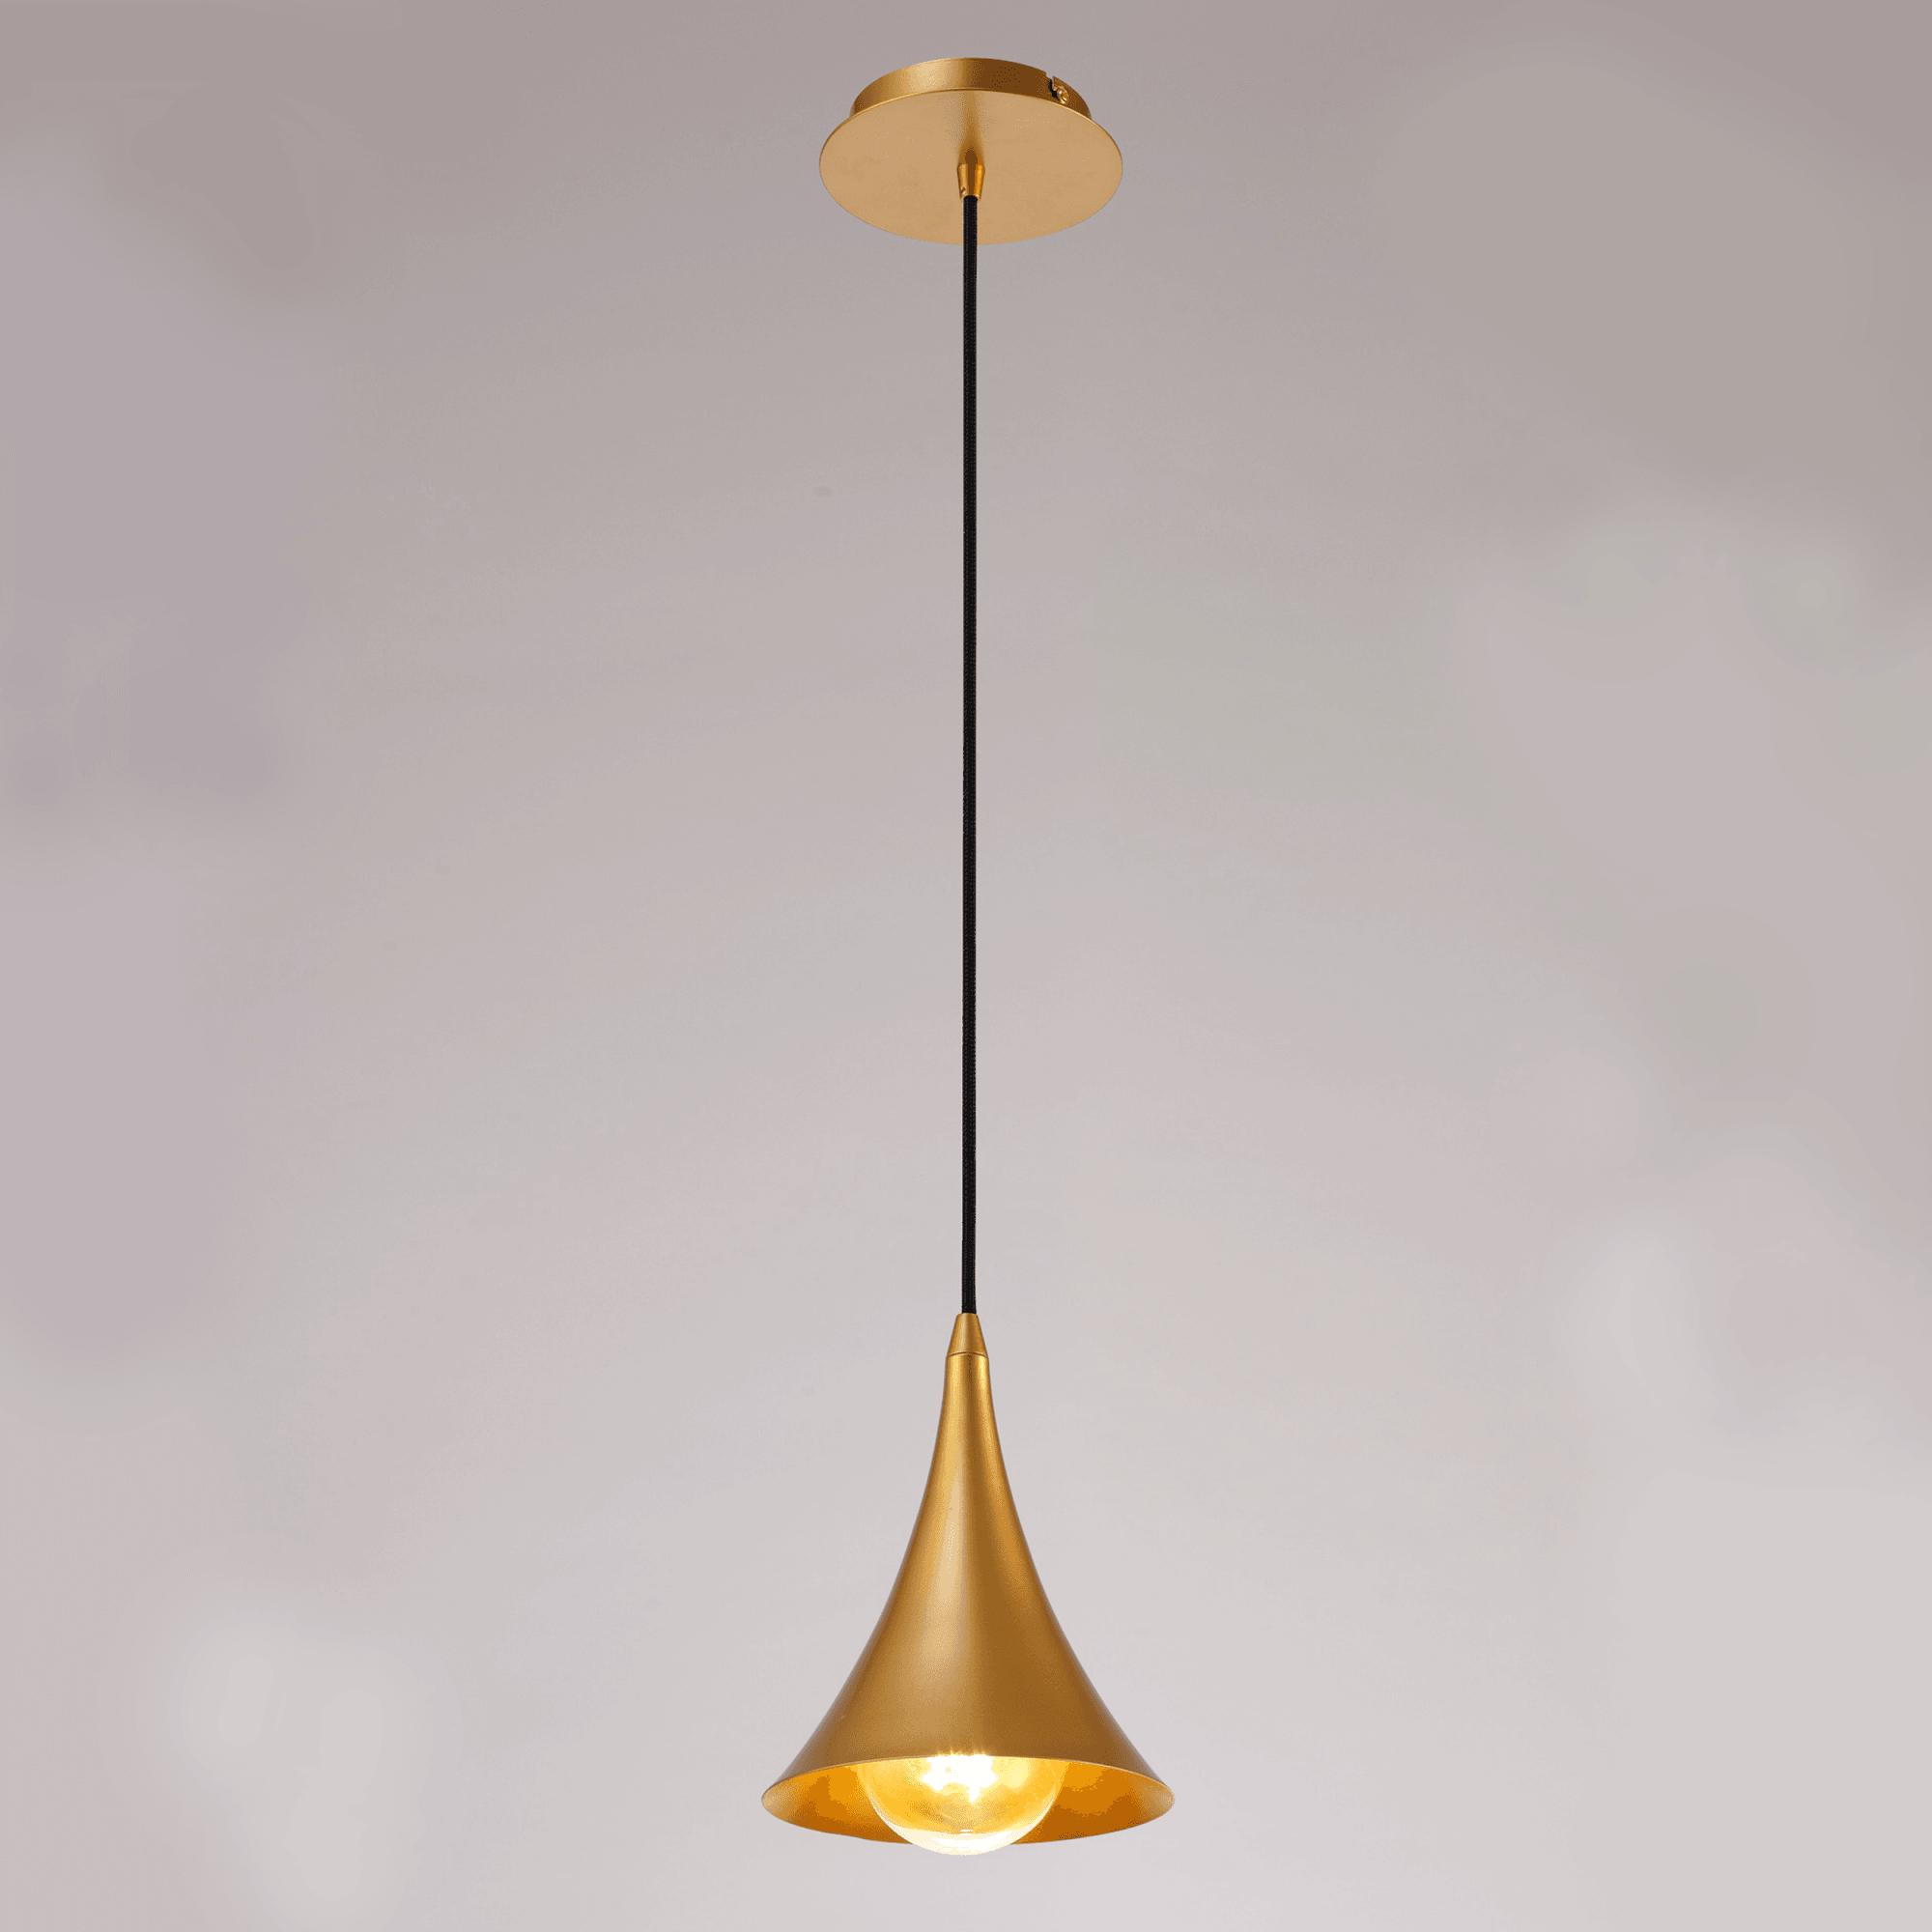 Mantra M6355 Jazz Single Cone Pendant Light In Painted Matt Gold